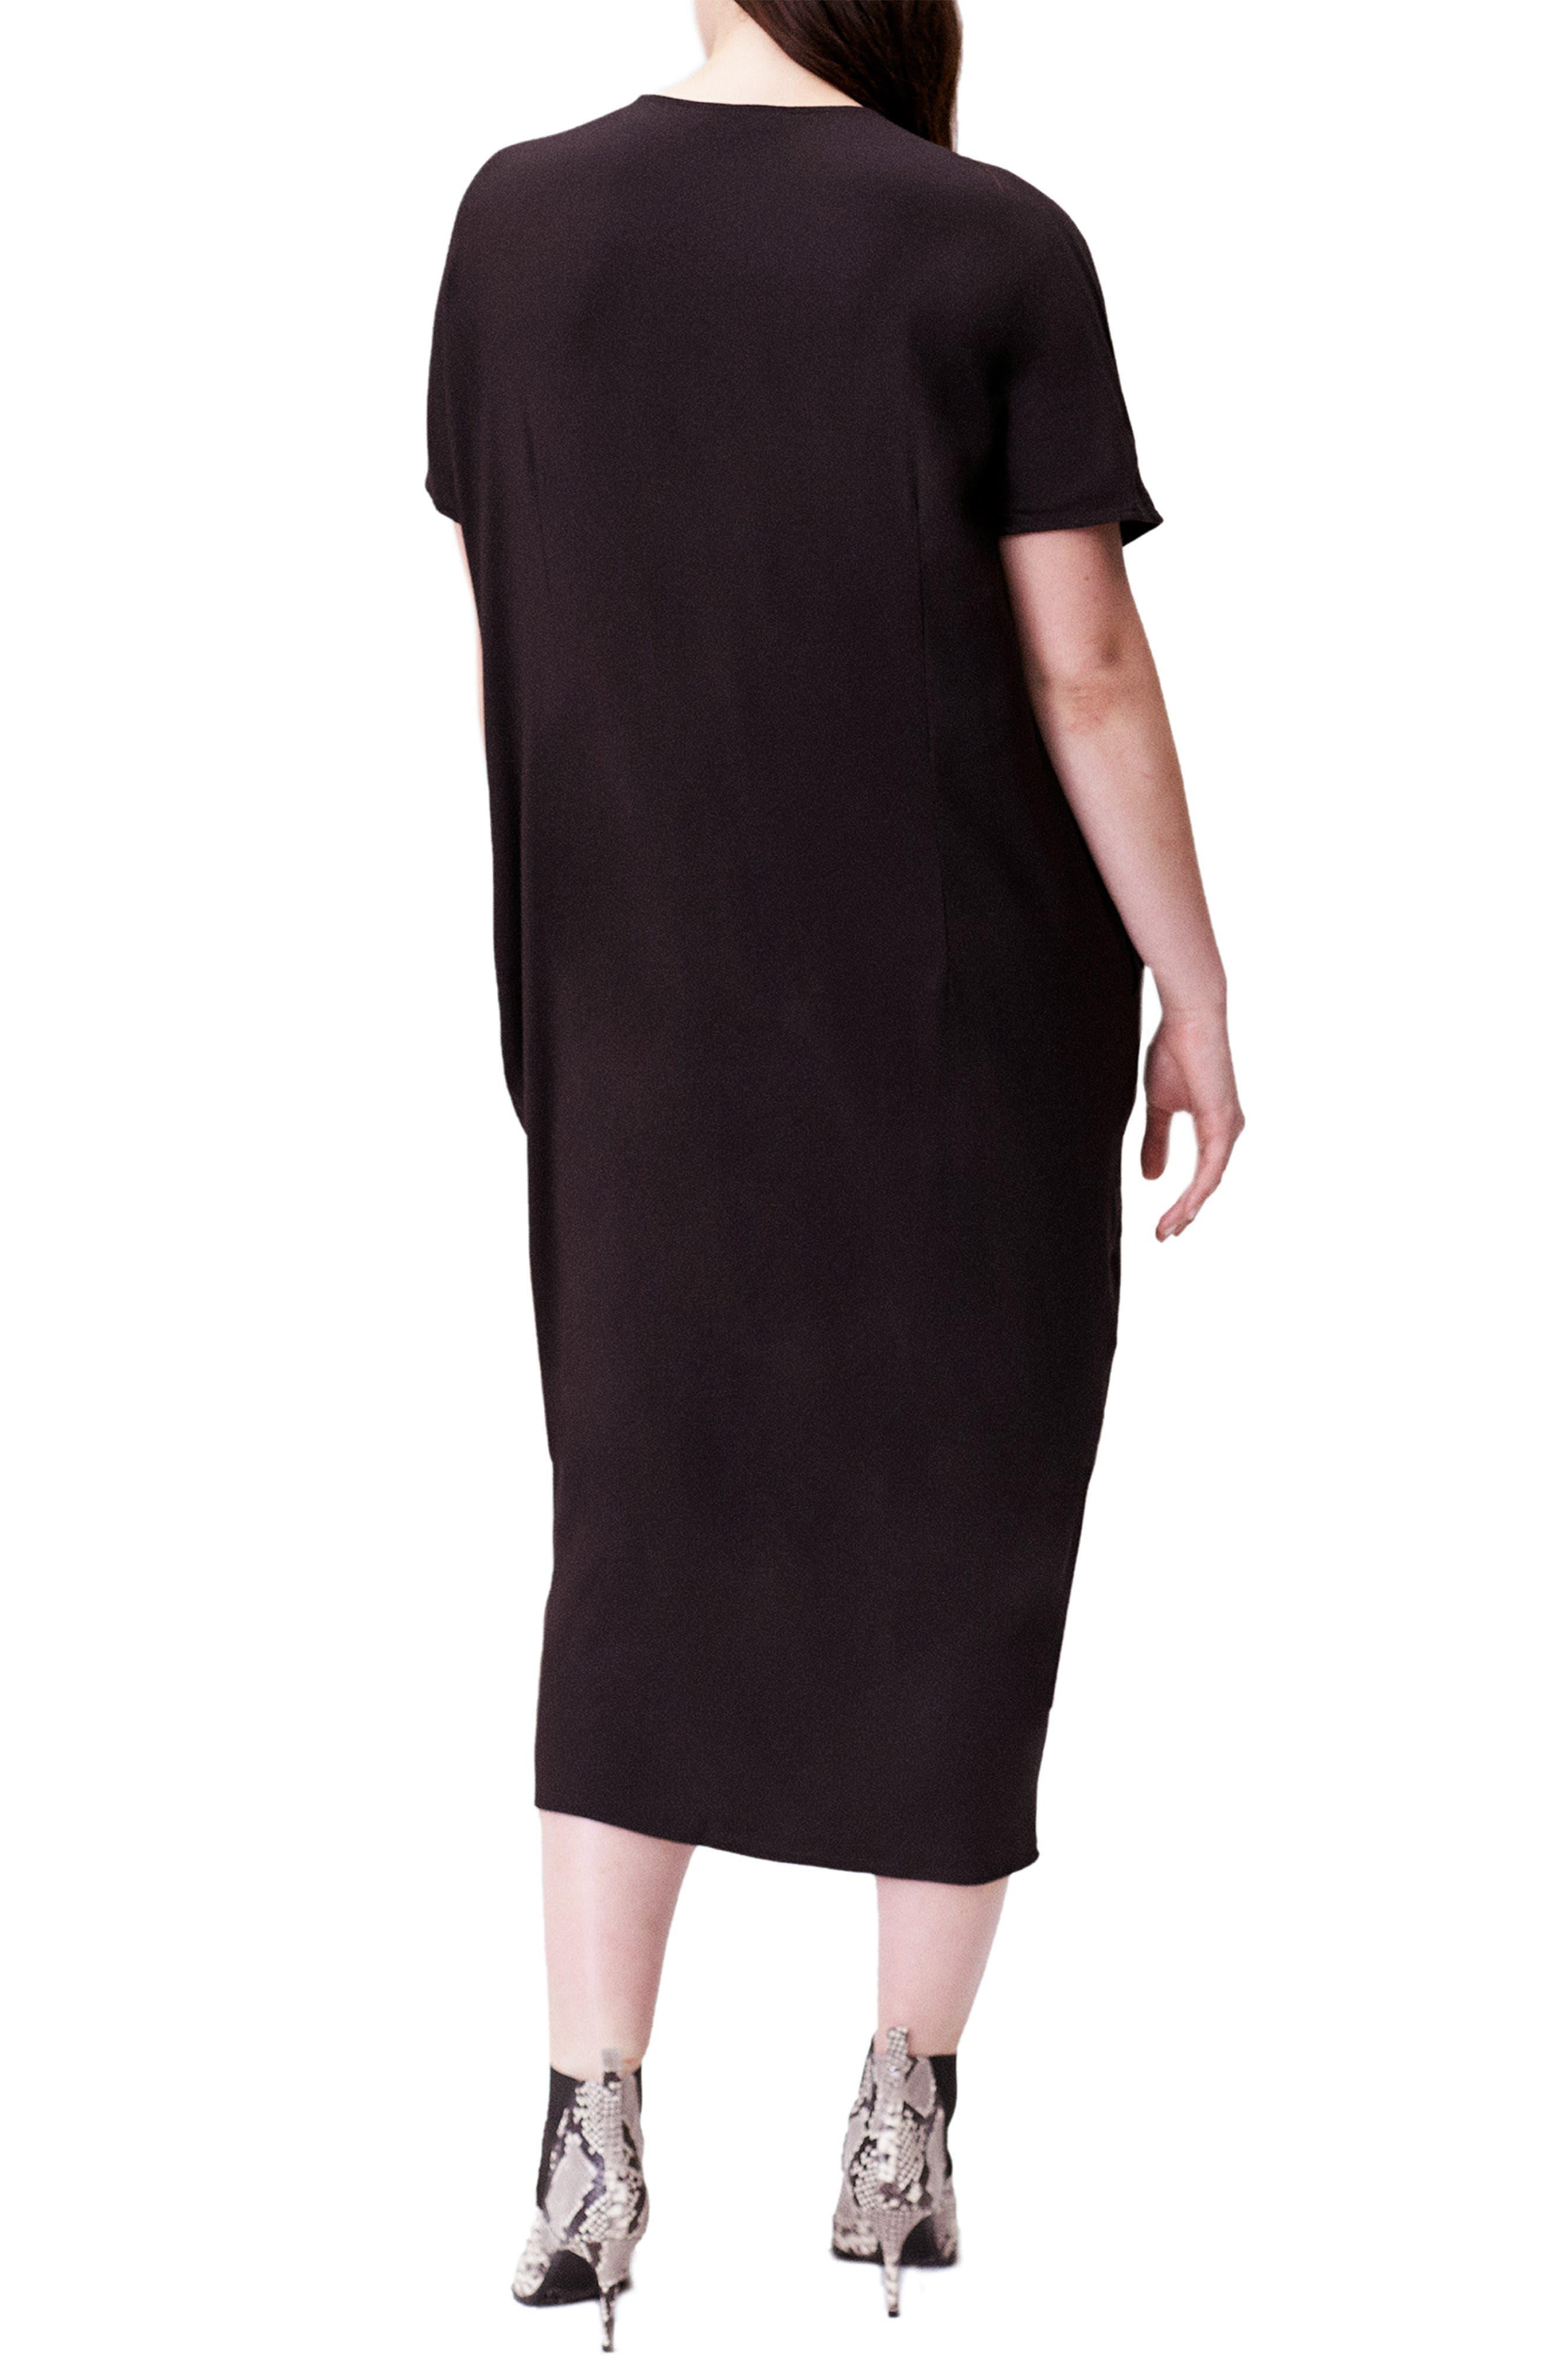 UNIVERSAL STANDARD, Crosby Caftan Dress, Alternate thumbnail 2, color, BLACK